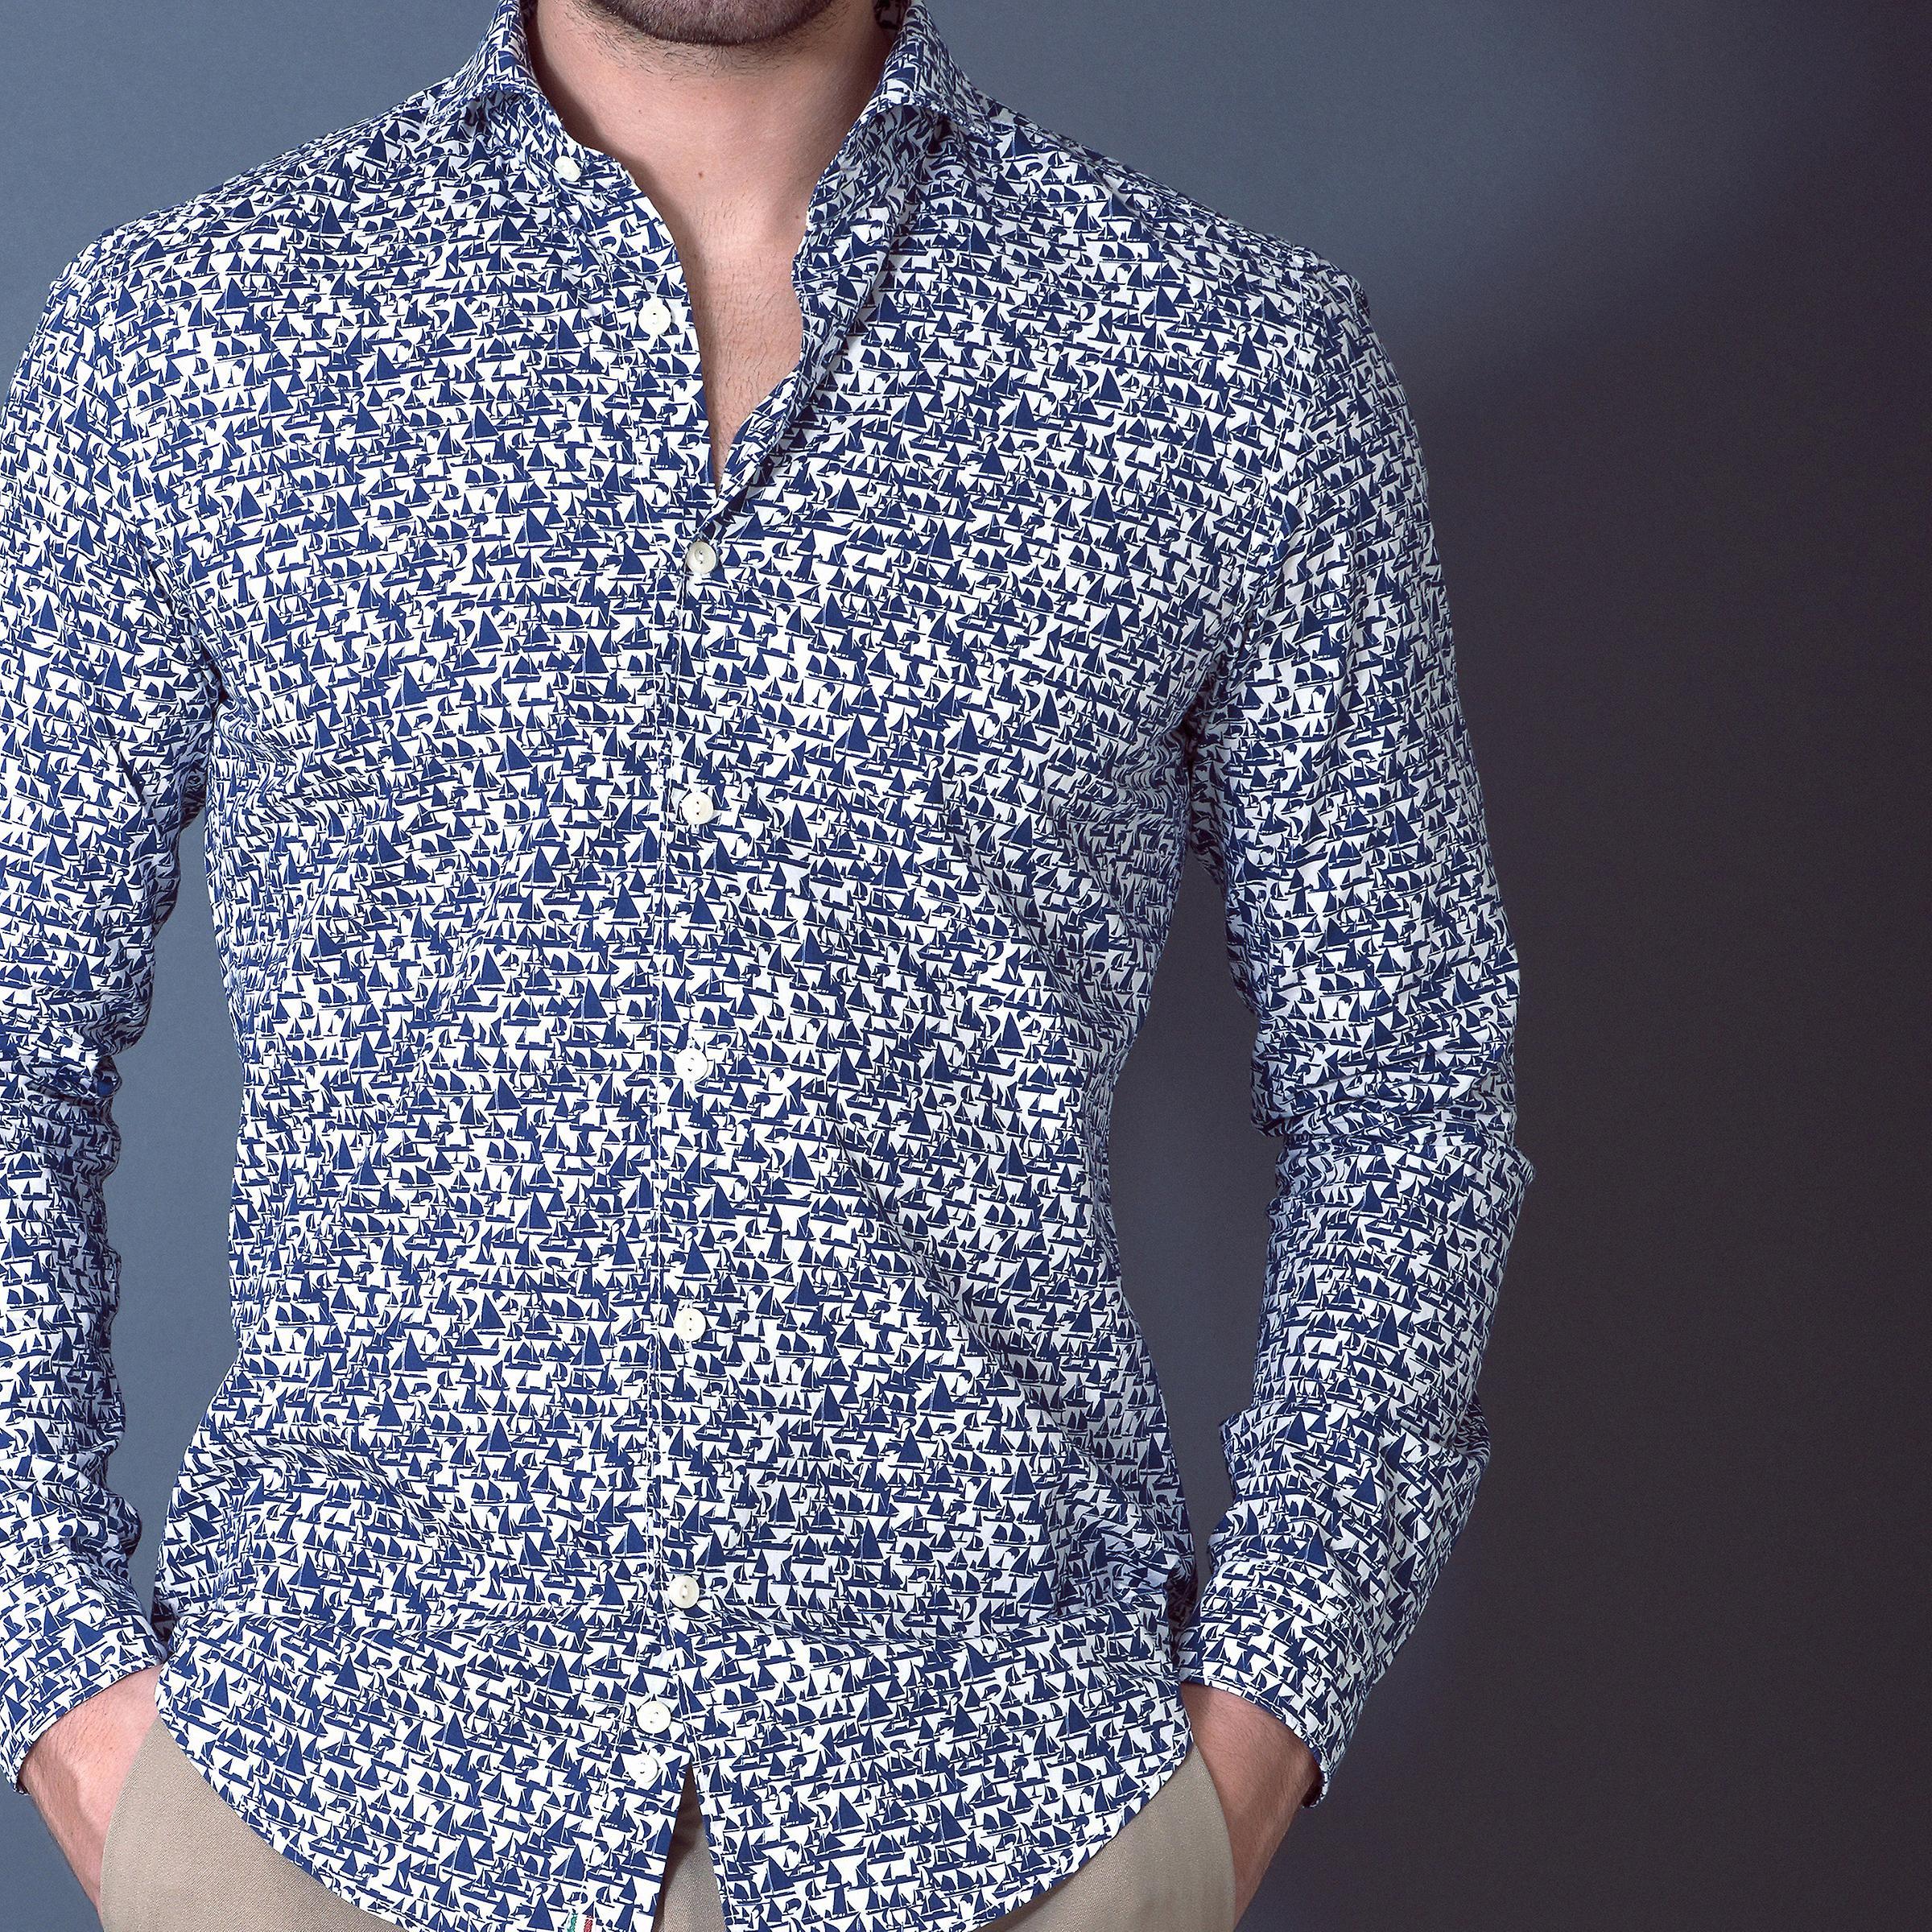 Fabio Giovanni Capertino Hemd - italienische lässig elegante Herrenshirt - Langarm